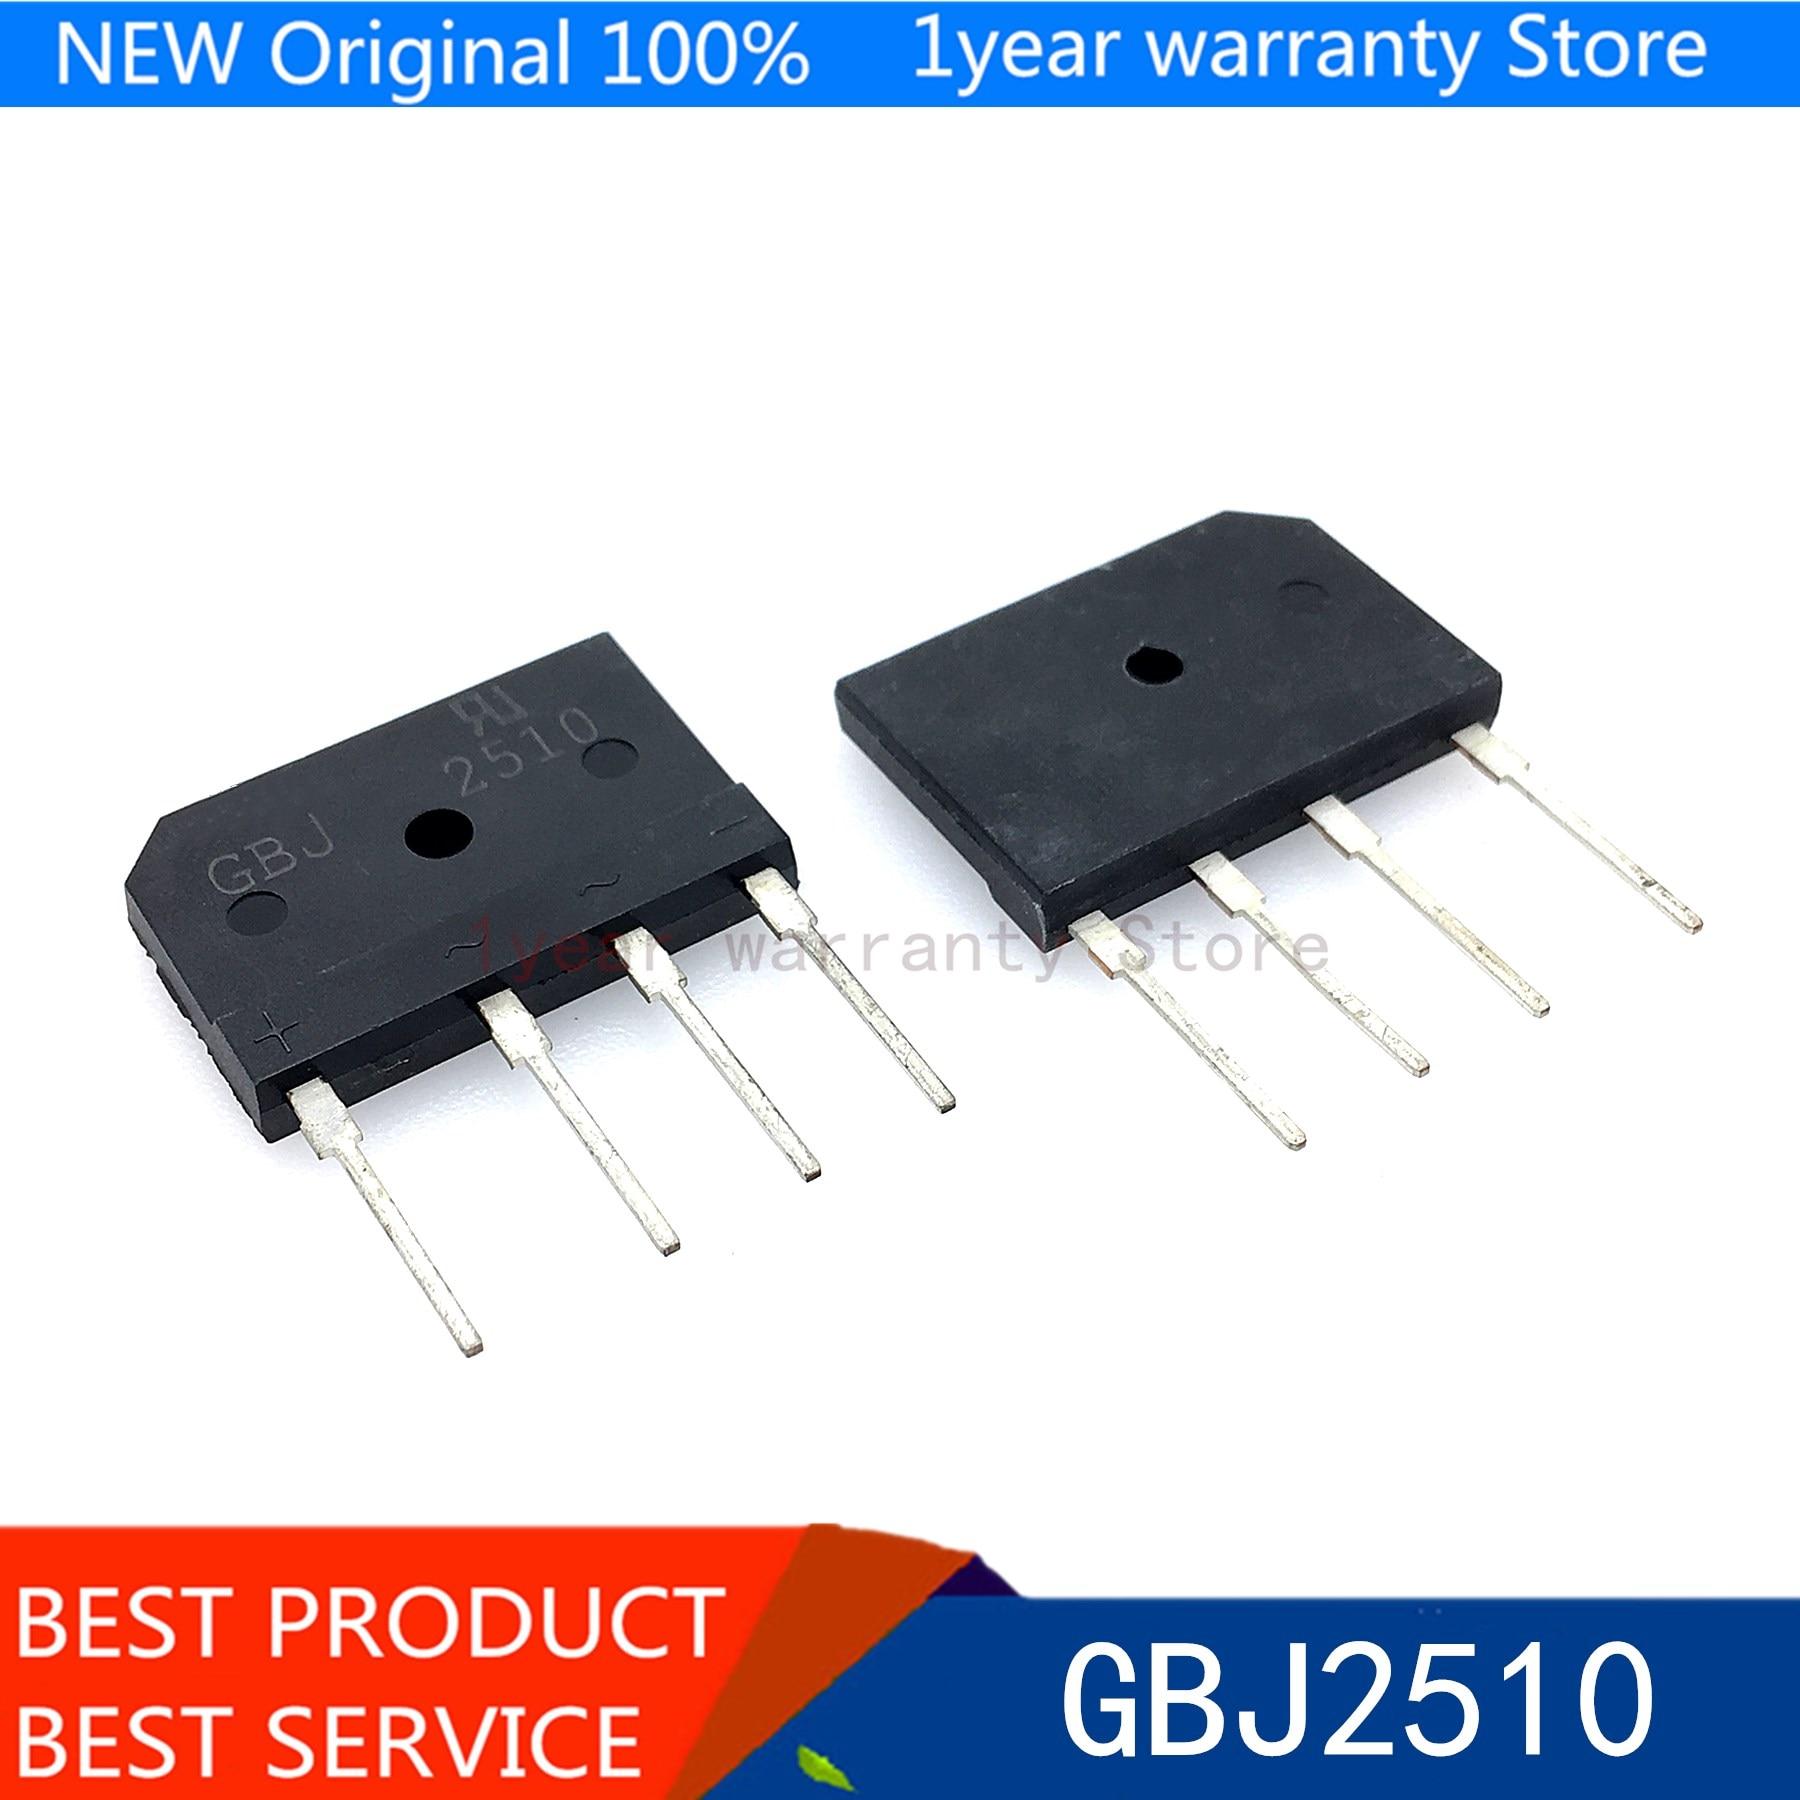 5 uds GBJ2510 KBJ2510 2510 25A 1000V rectificador de puente